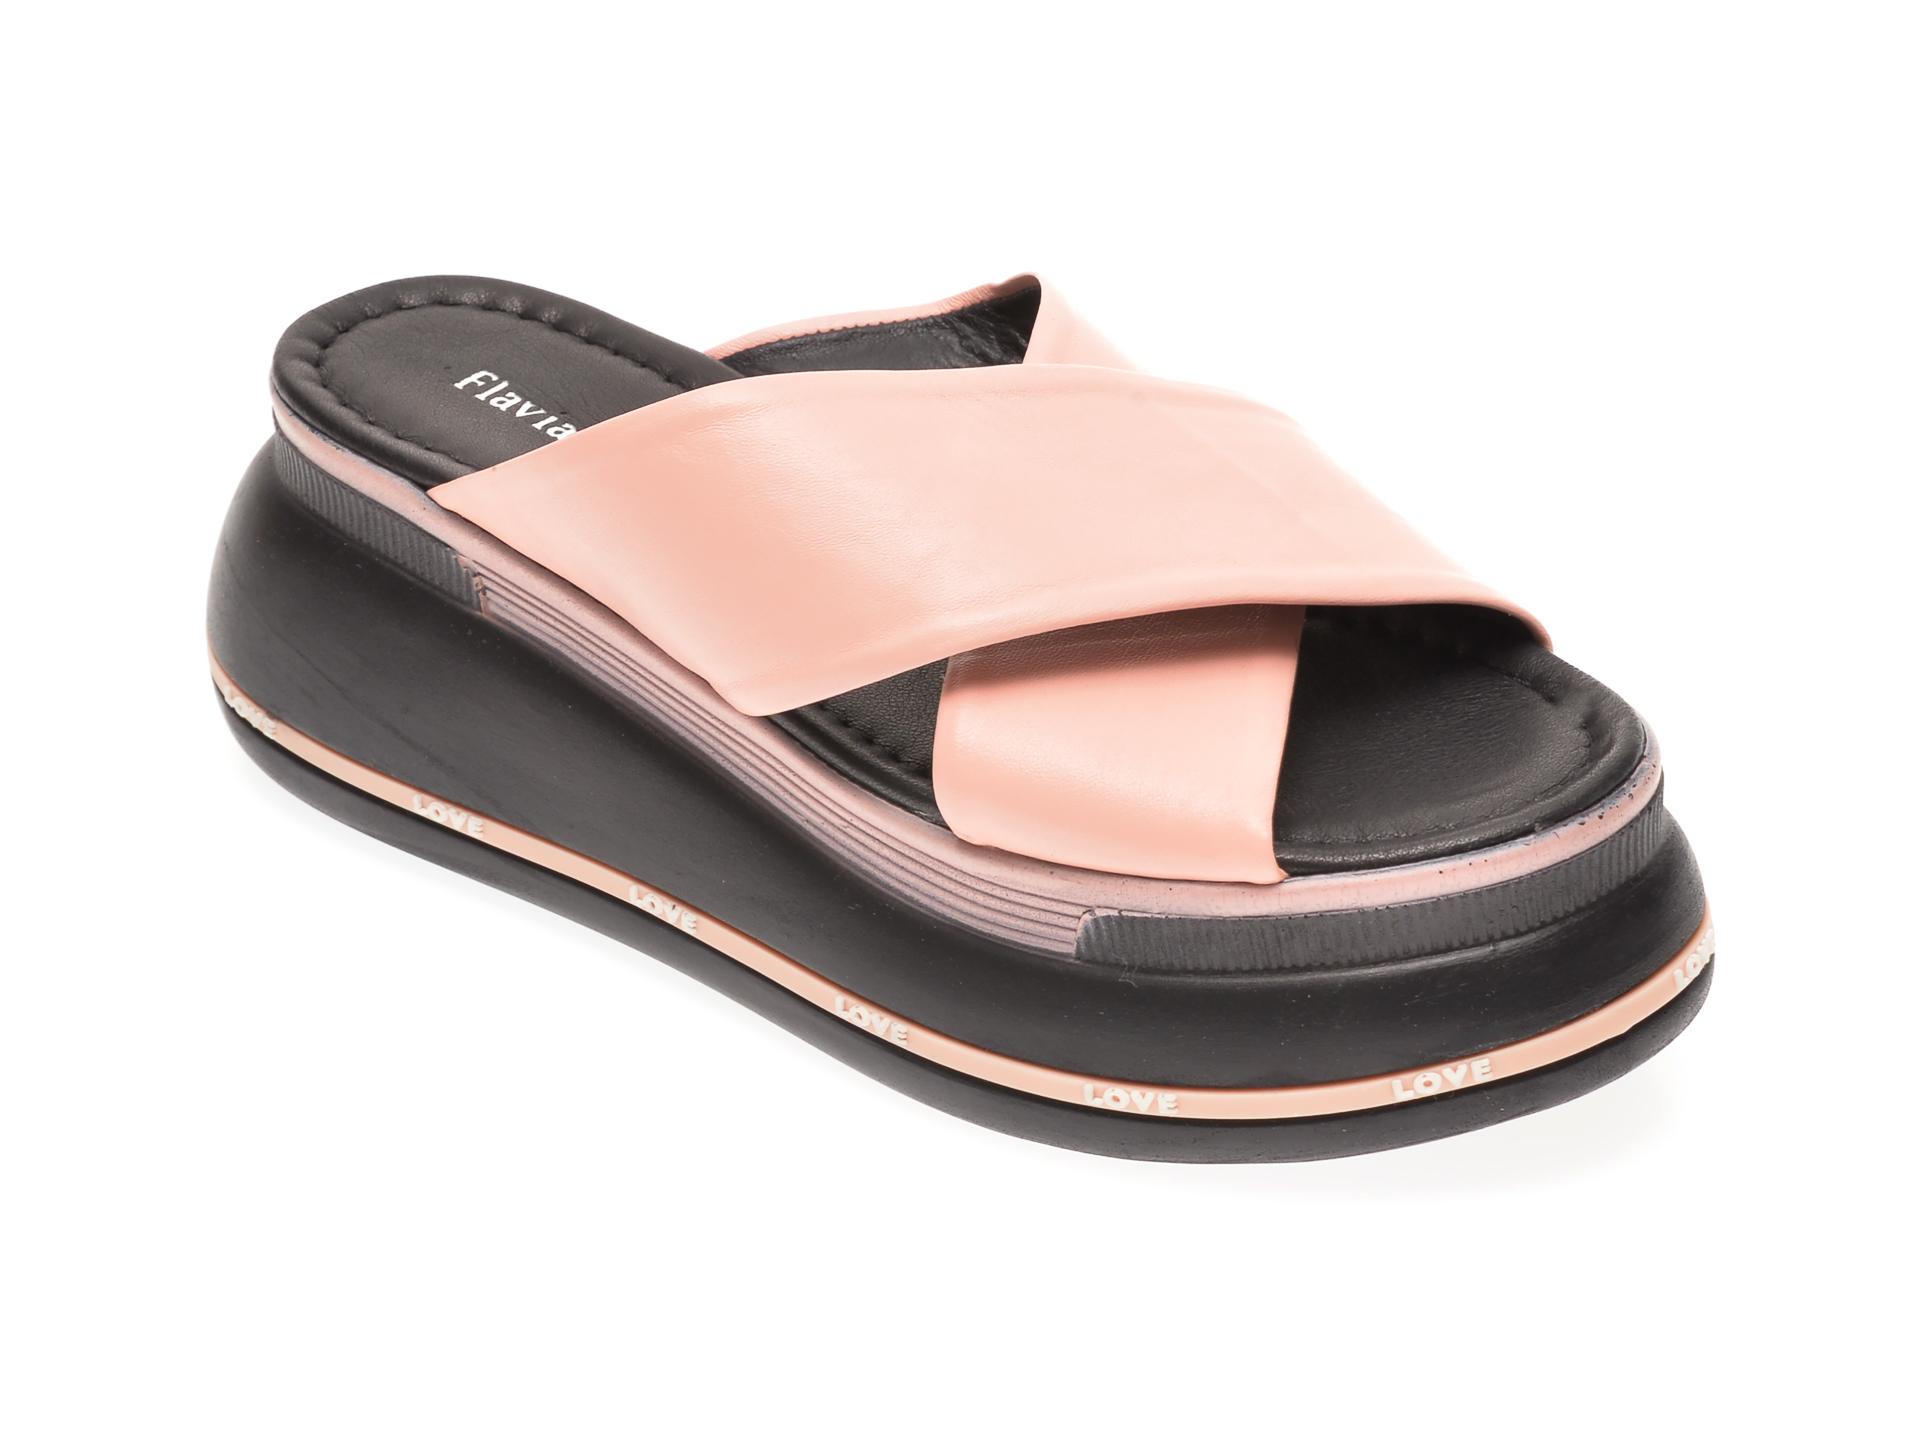 Papuci FLAVIA PASSINI roz, 1182544, din piele naturala